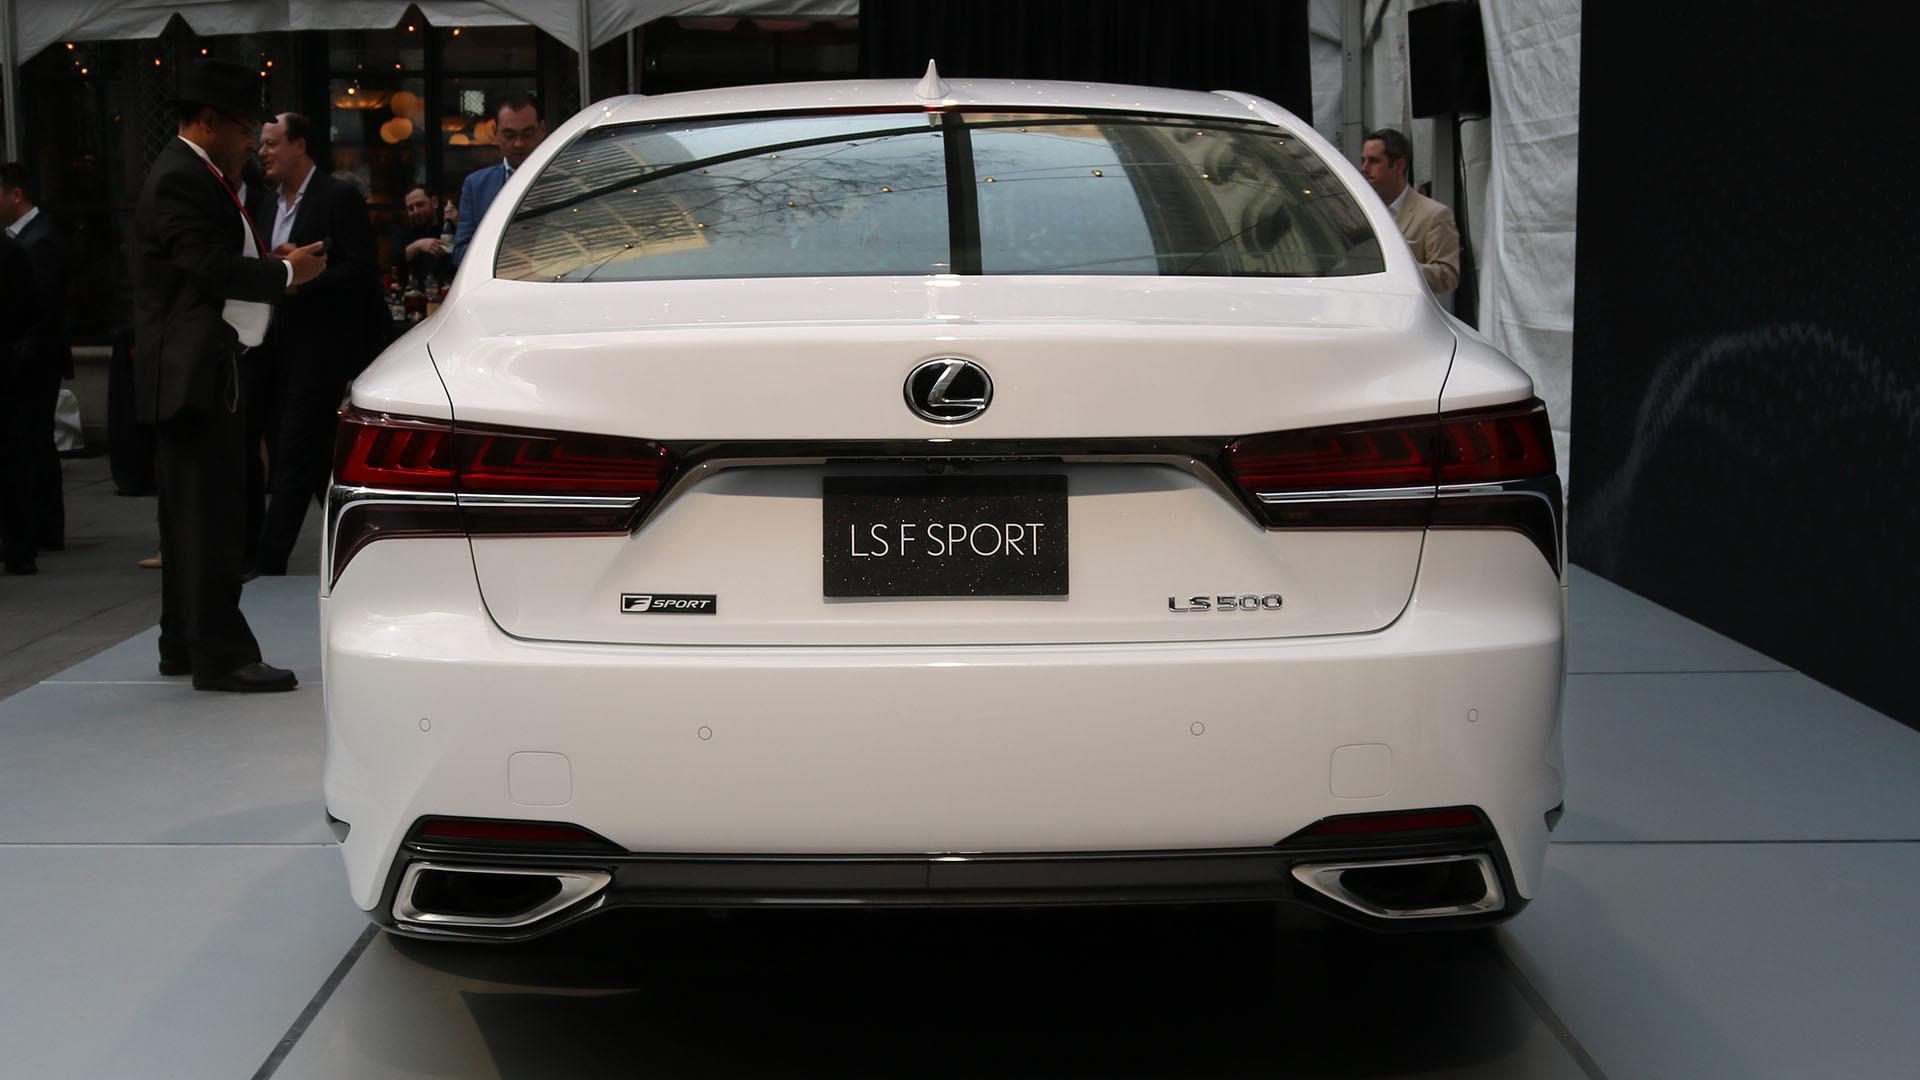 https://icdn-0.motor1.com/images/mgl/v2QxQ/s1/2018-lexus-ls-500-f-sport.jpg